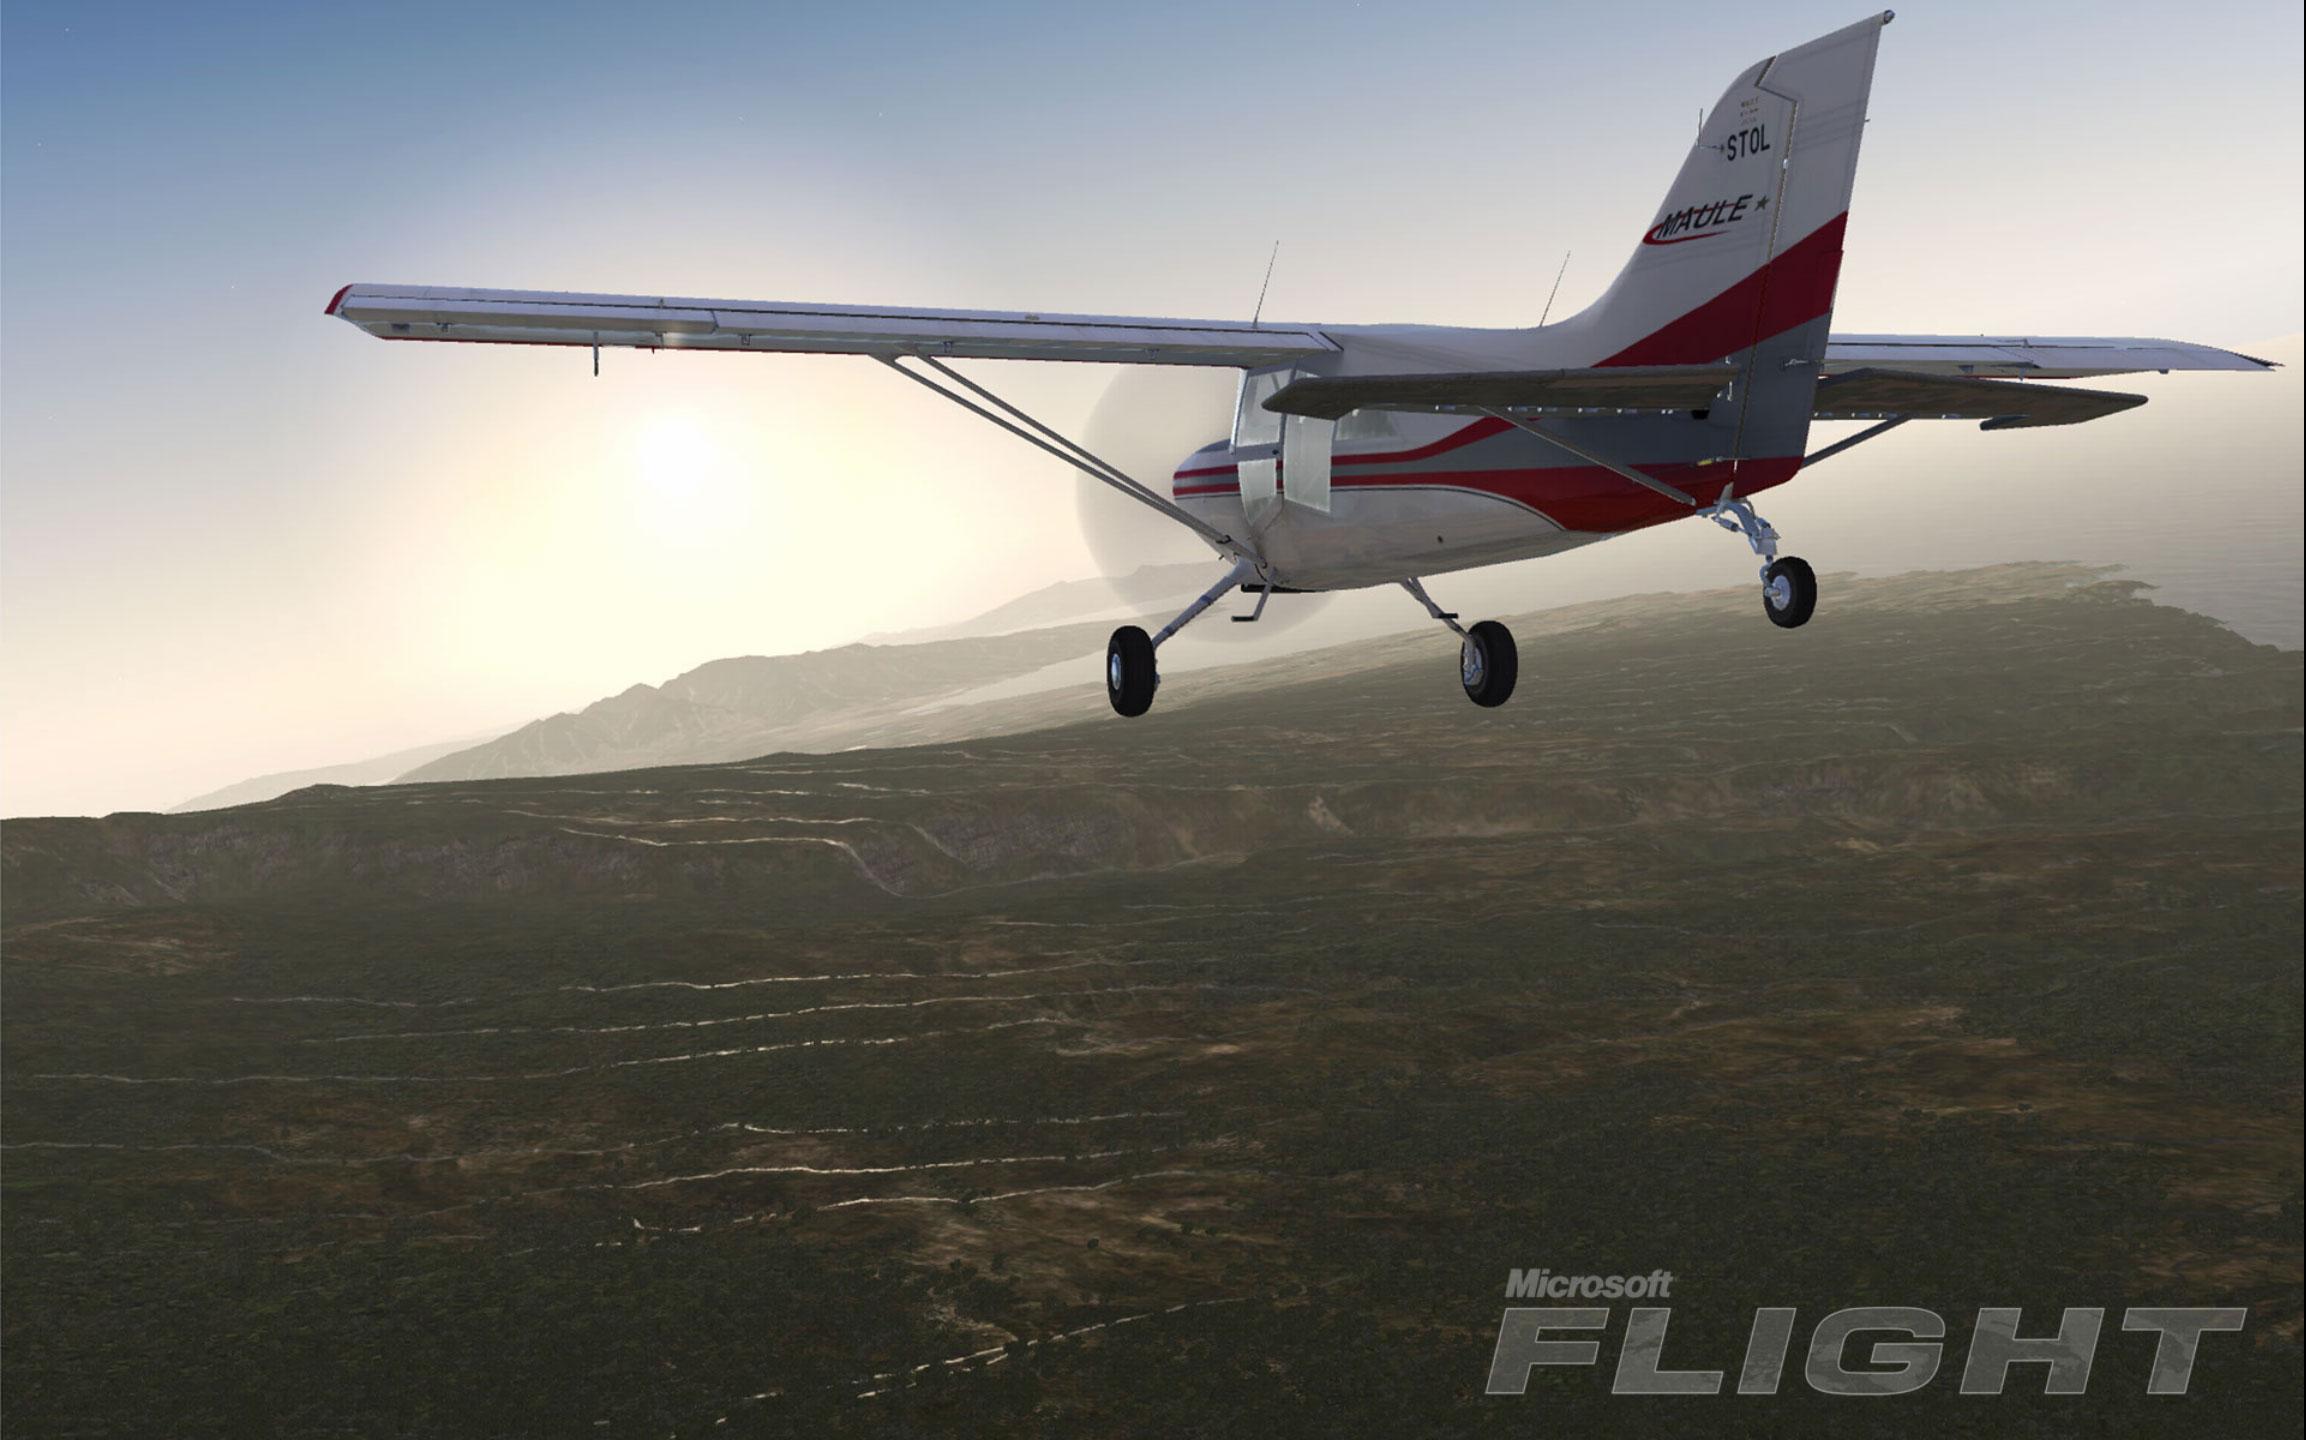 microsoft-flight-screenshot-9.jpg